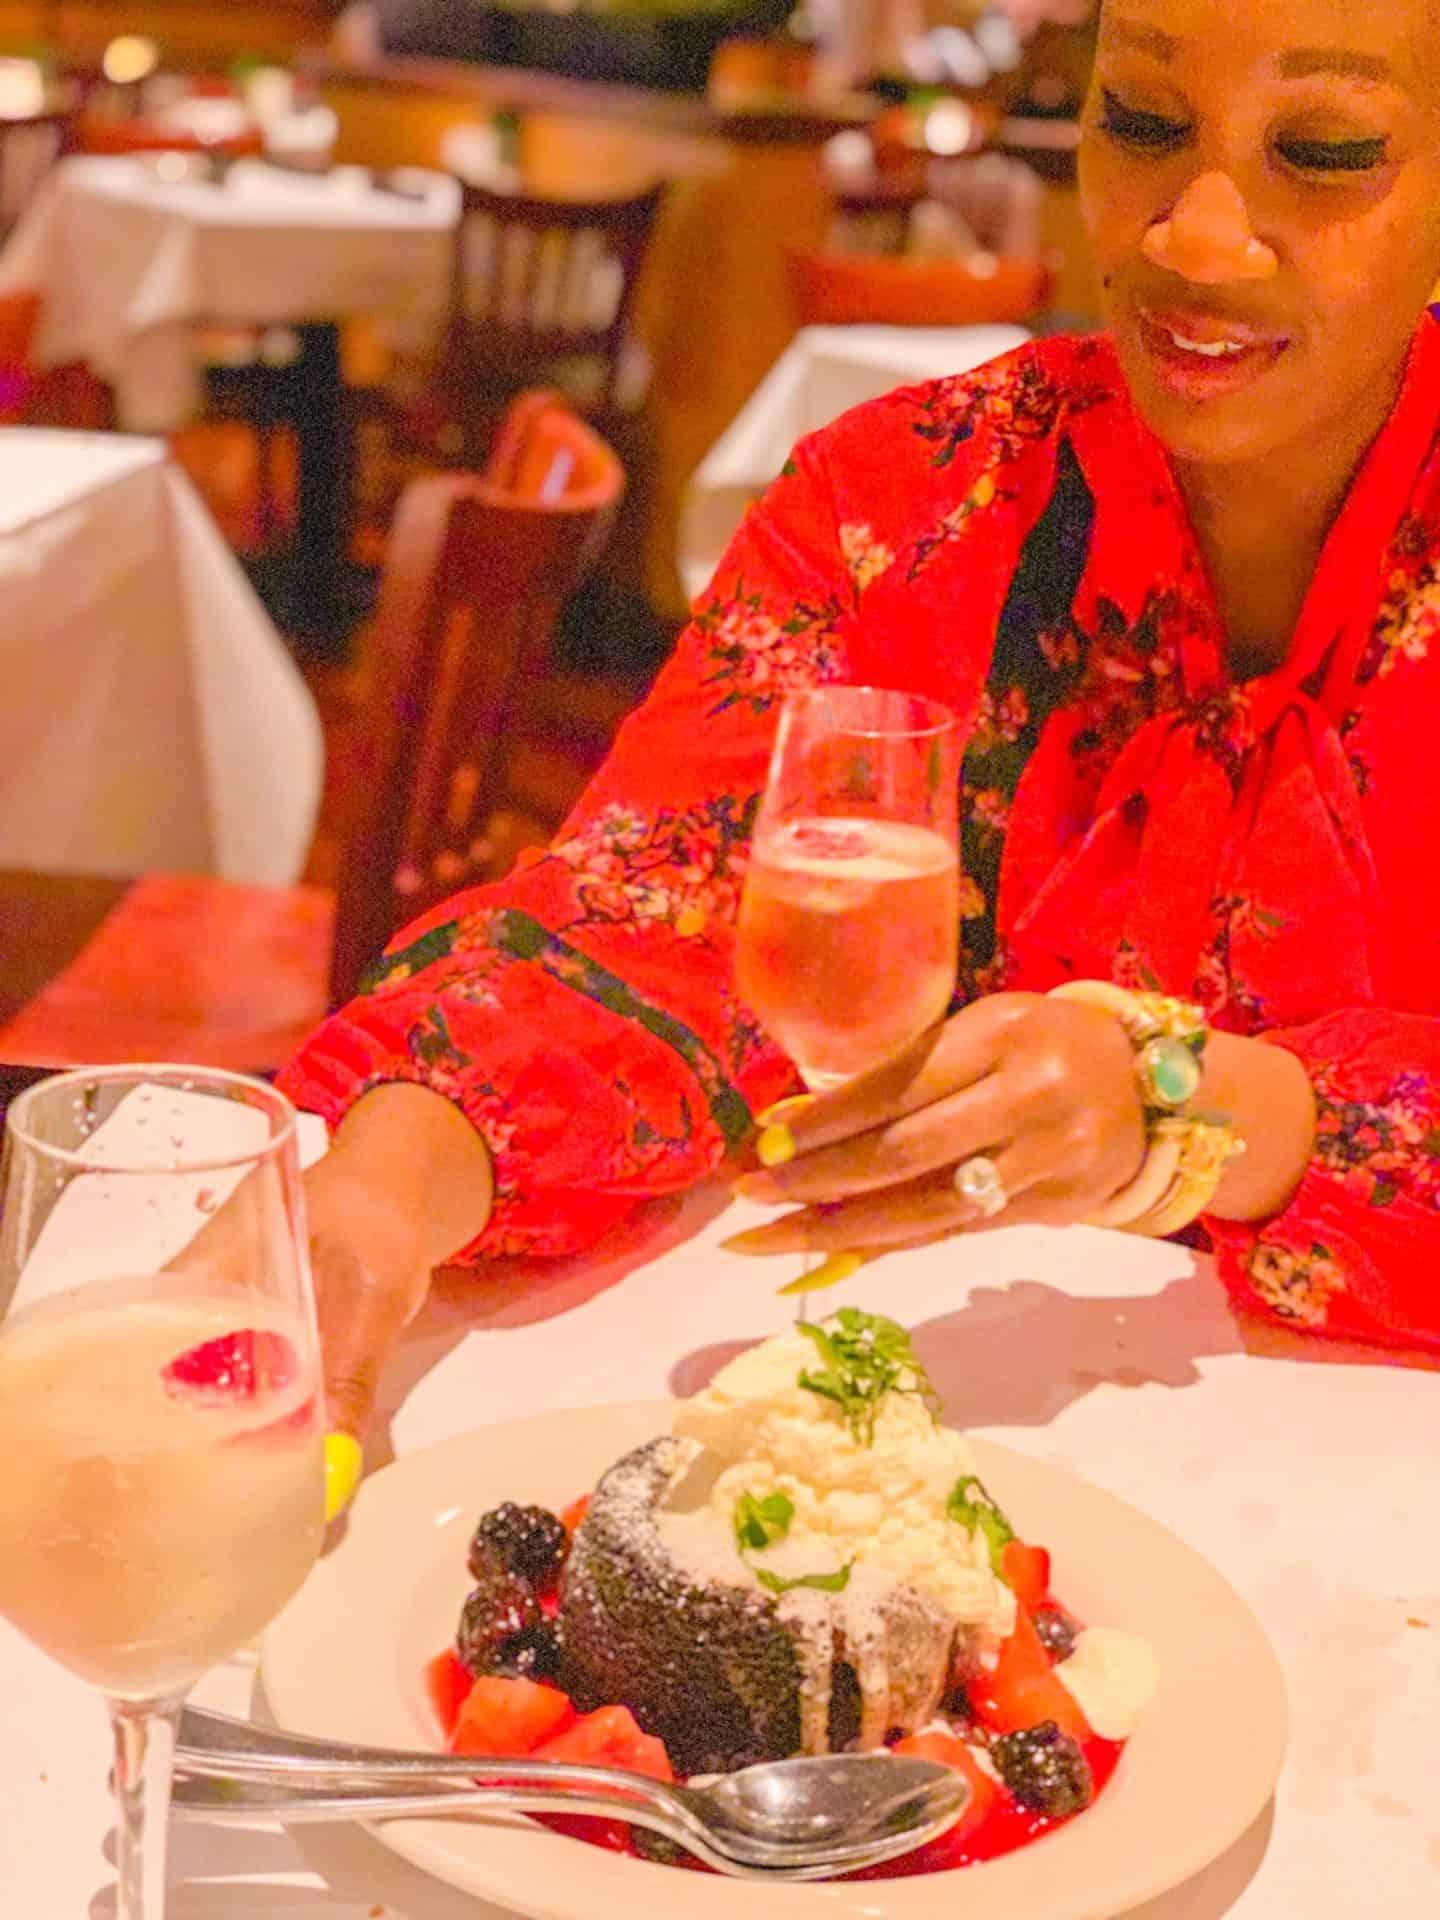 Shaunda Necole | Our Valentine's Dinner At Bonefish Grill- Lava Cake Dessert